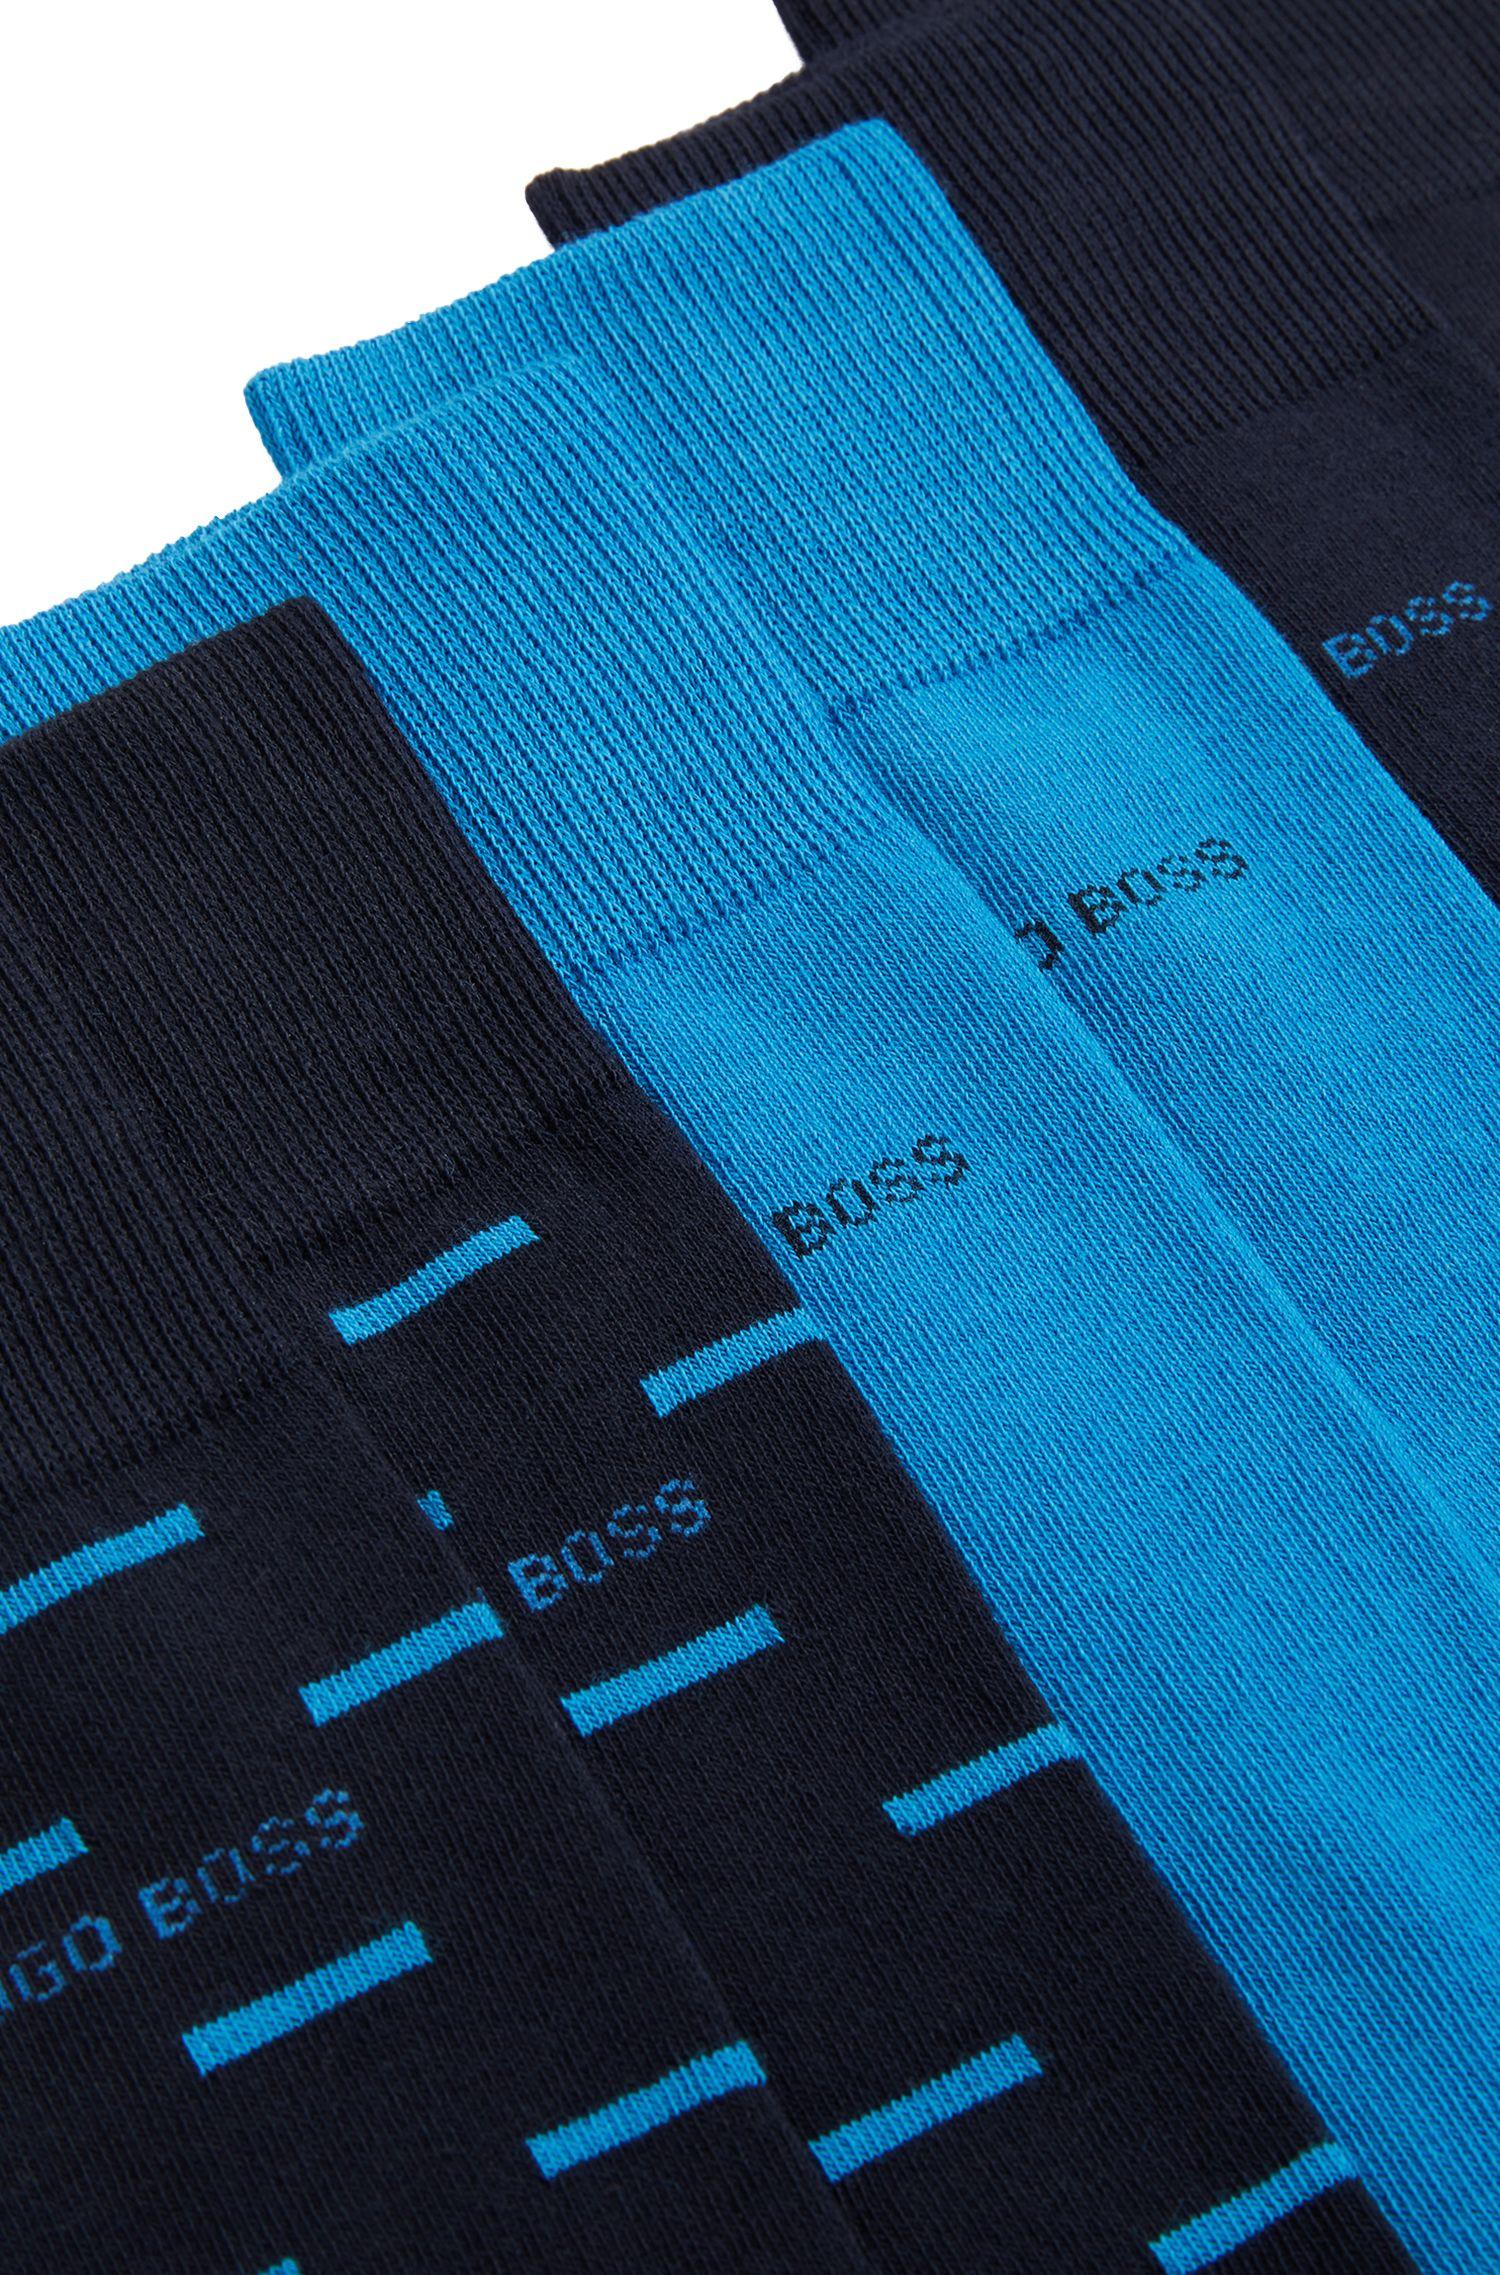 Three-pack of socks in branded gift box